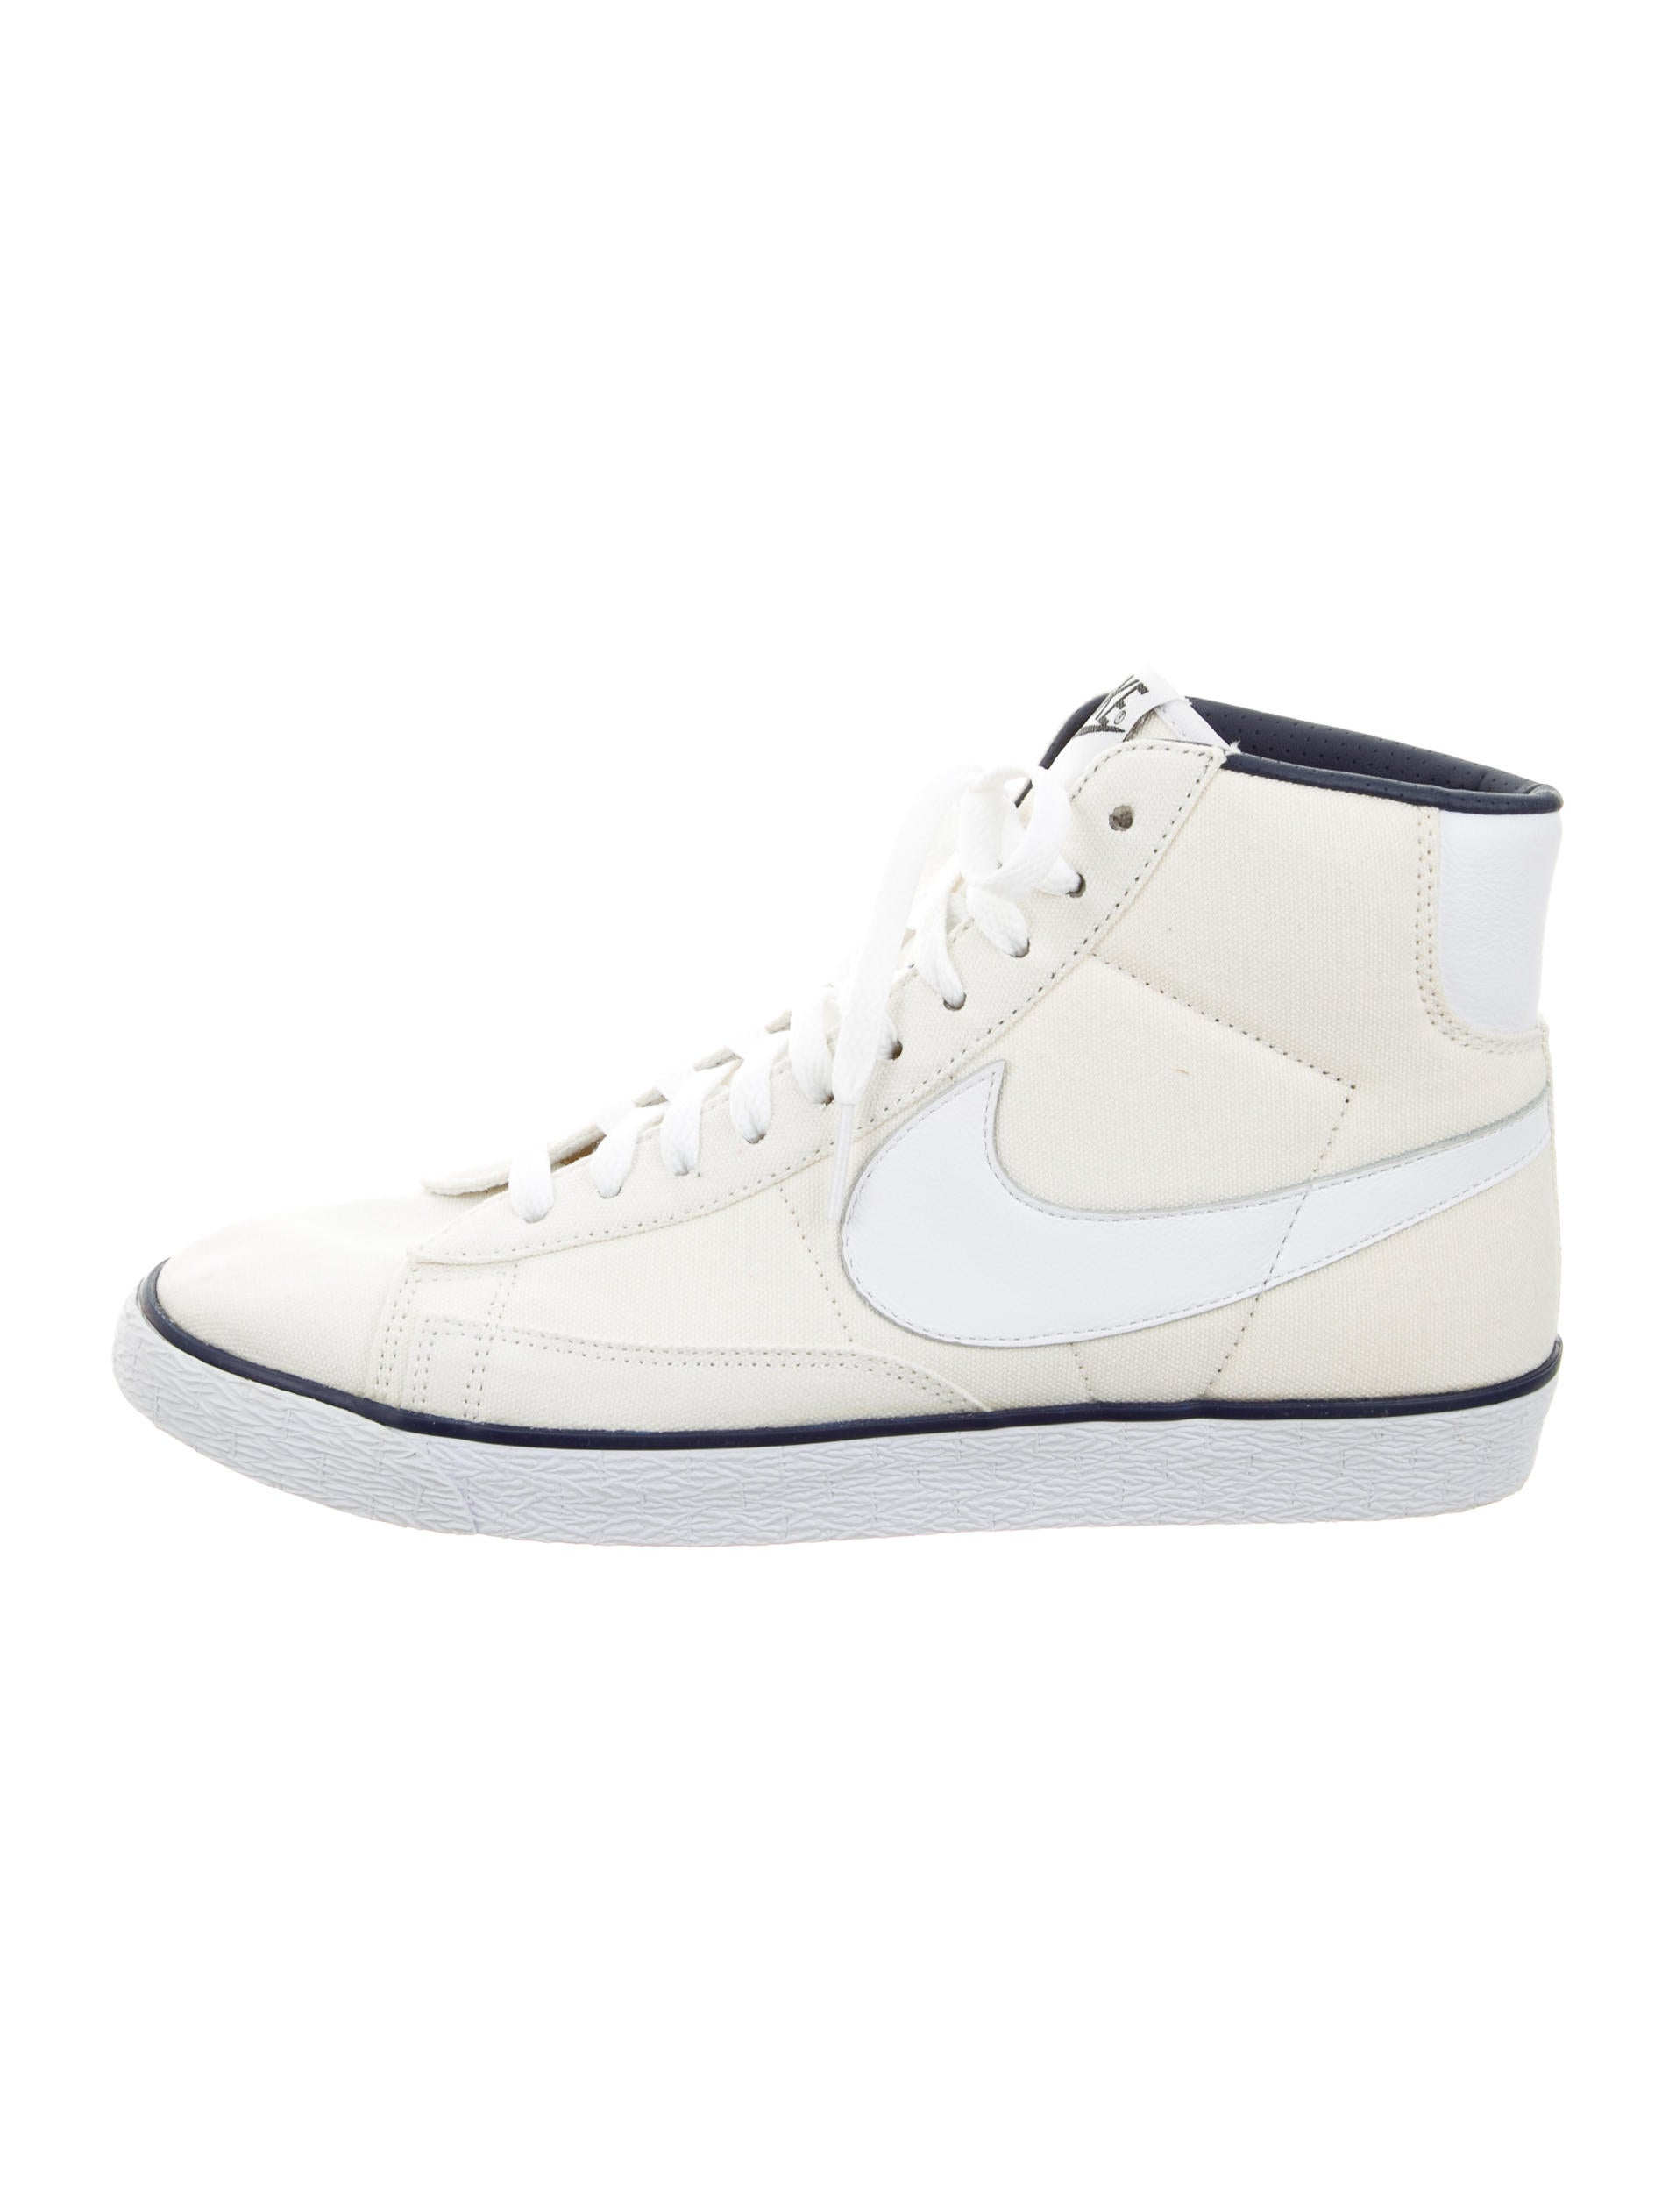 new concept 1a4b3 47e76 ... buy canvas blazer sneakers w tags f30a8 b5027